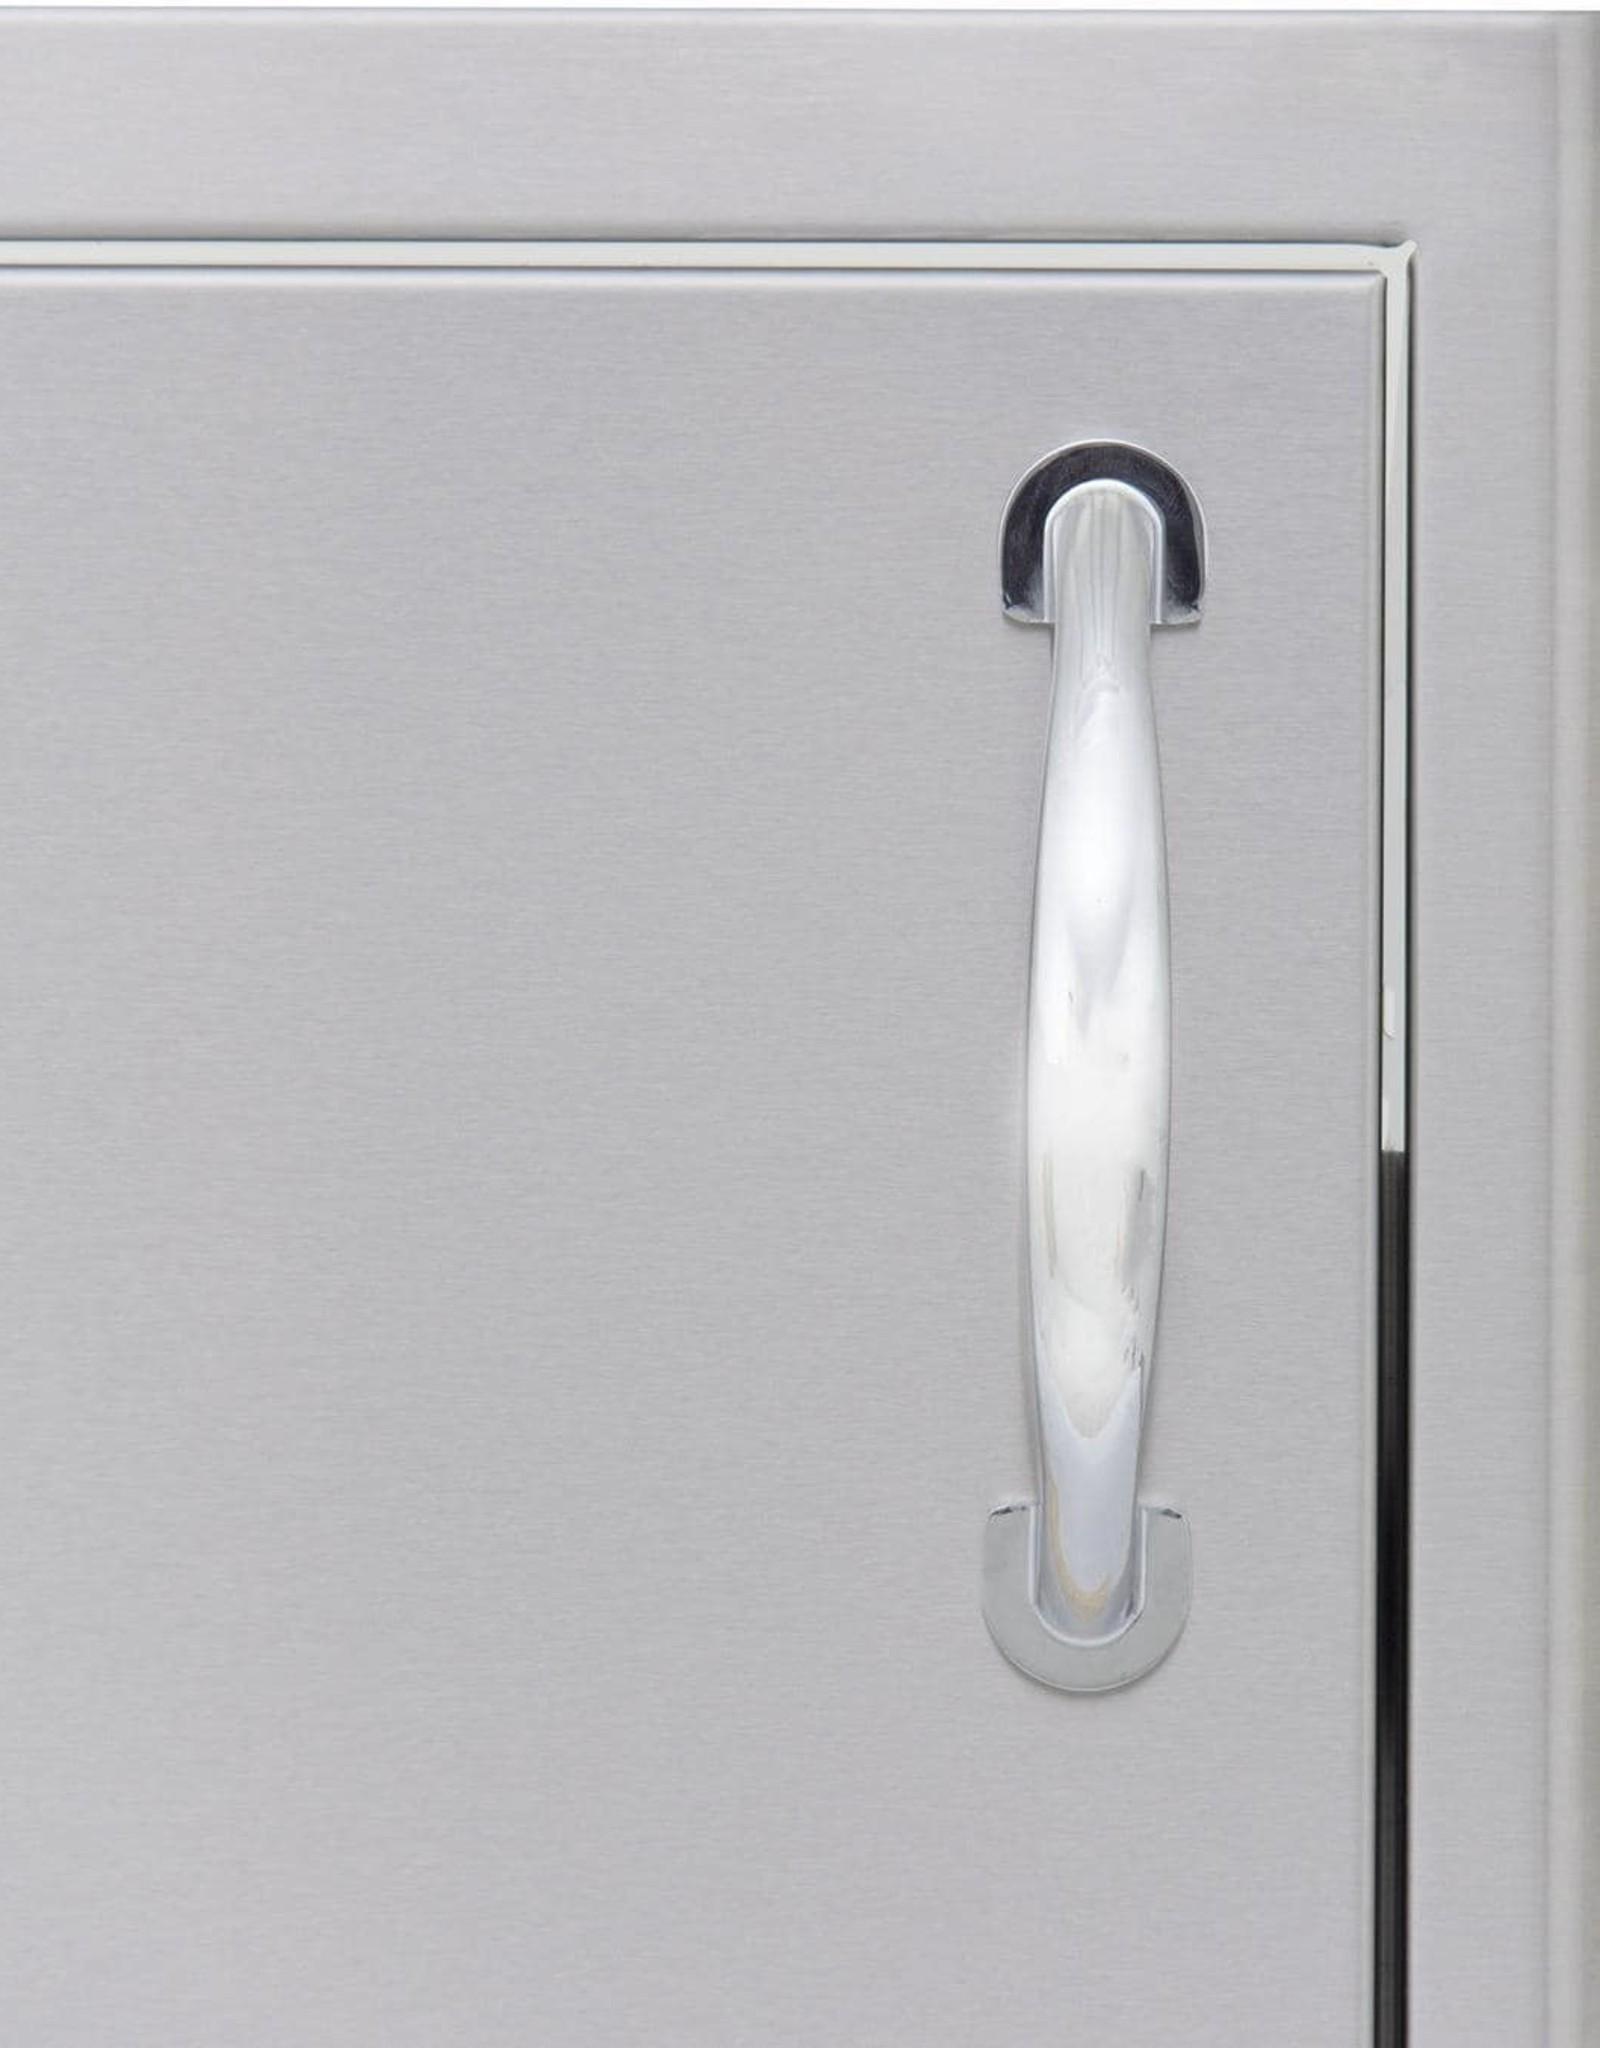 Blaze Outdoor Products Blaze 21-Inch Left Hinged Stainless Steel Single Access Door - Vertical - BLZ-SINGLE-2417-R-LH